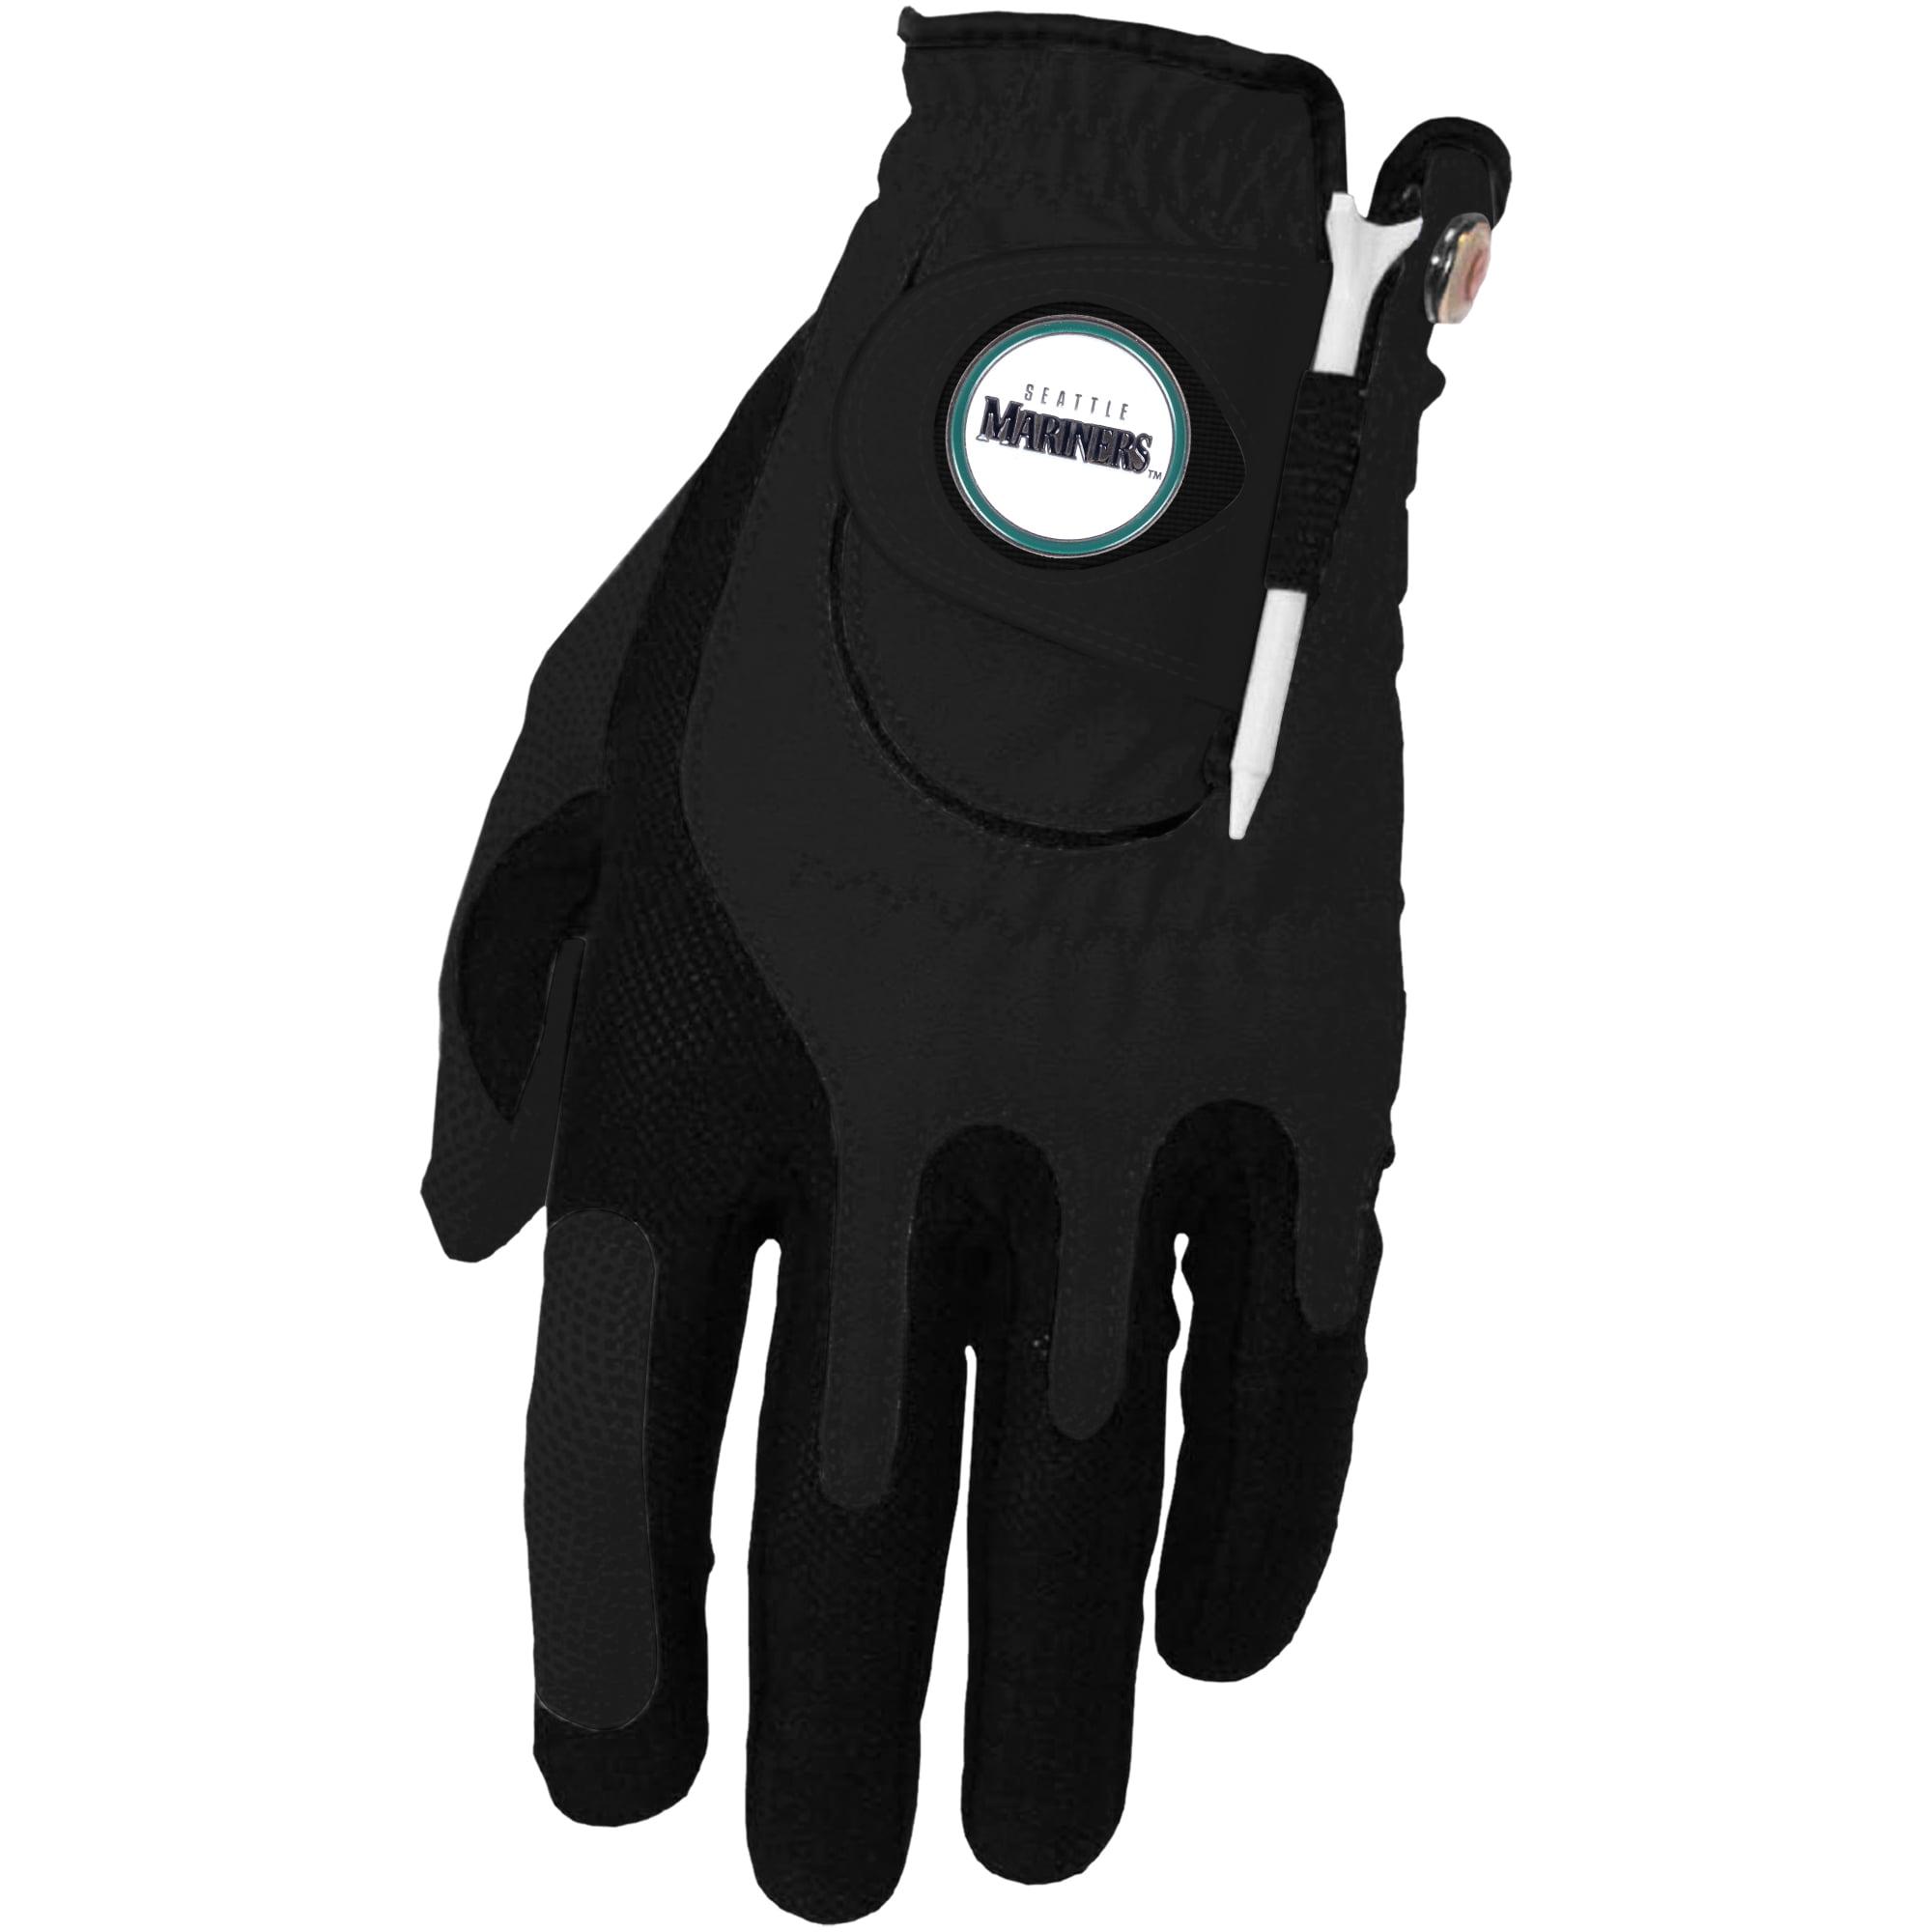 Seattle Mariners Left Hand Golf Glove & Ball Marker Set - Black - OSFM